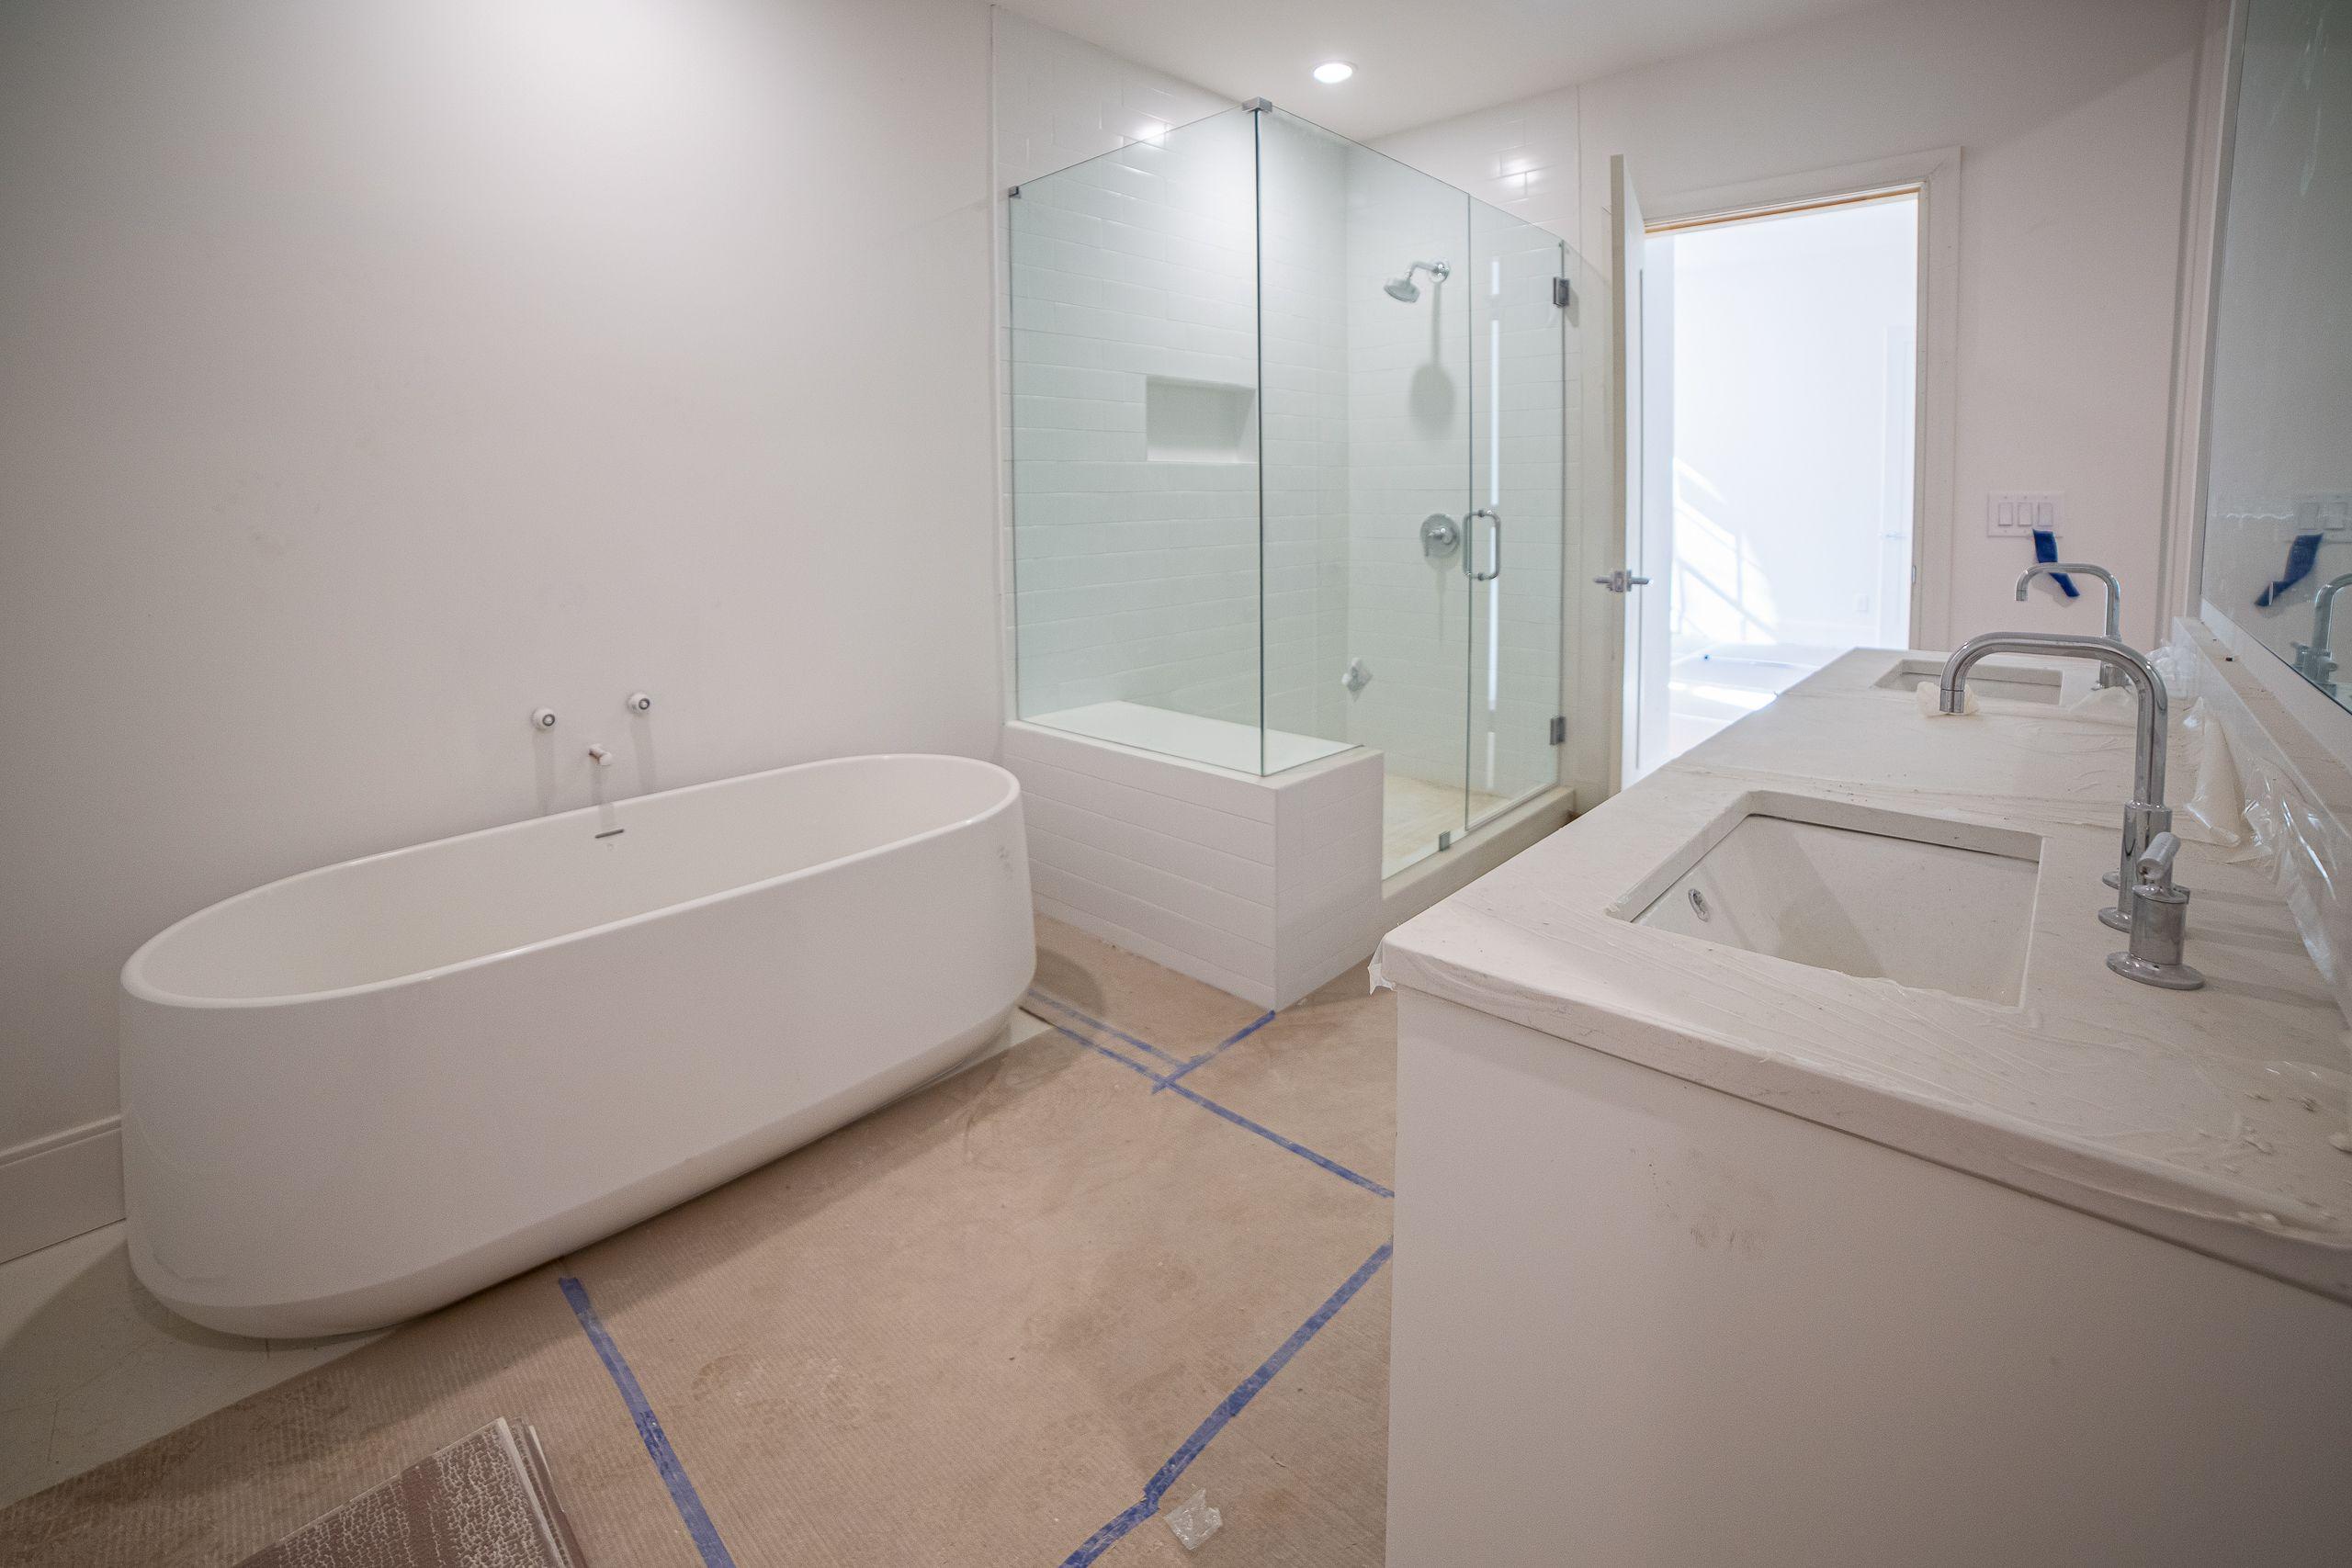 Bathroom featured in the Briarcliff Condo By Minerva Homes in Atlanta, GA